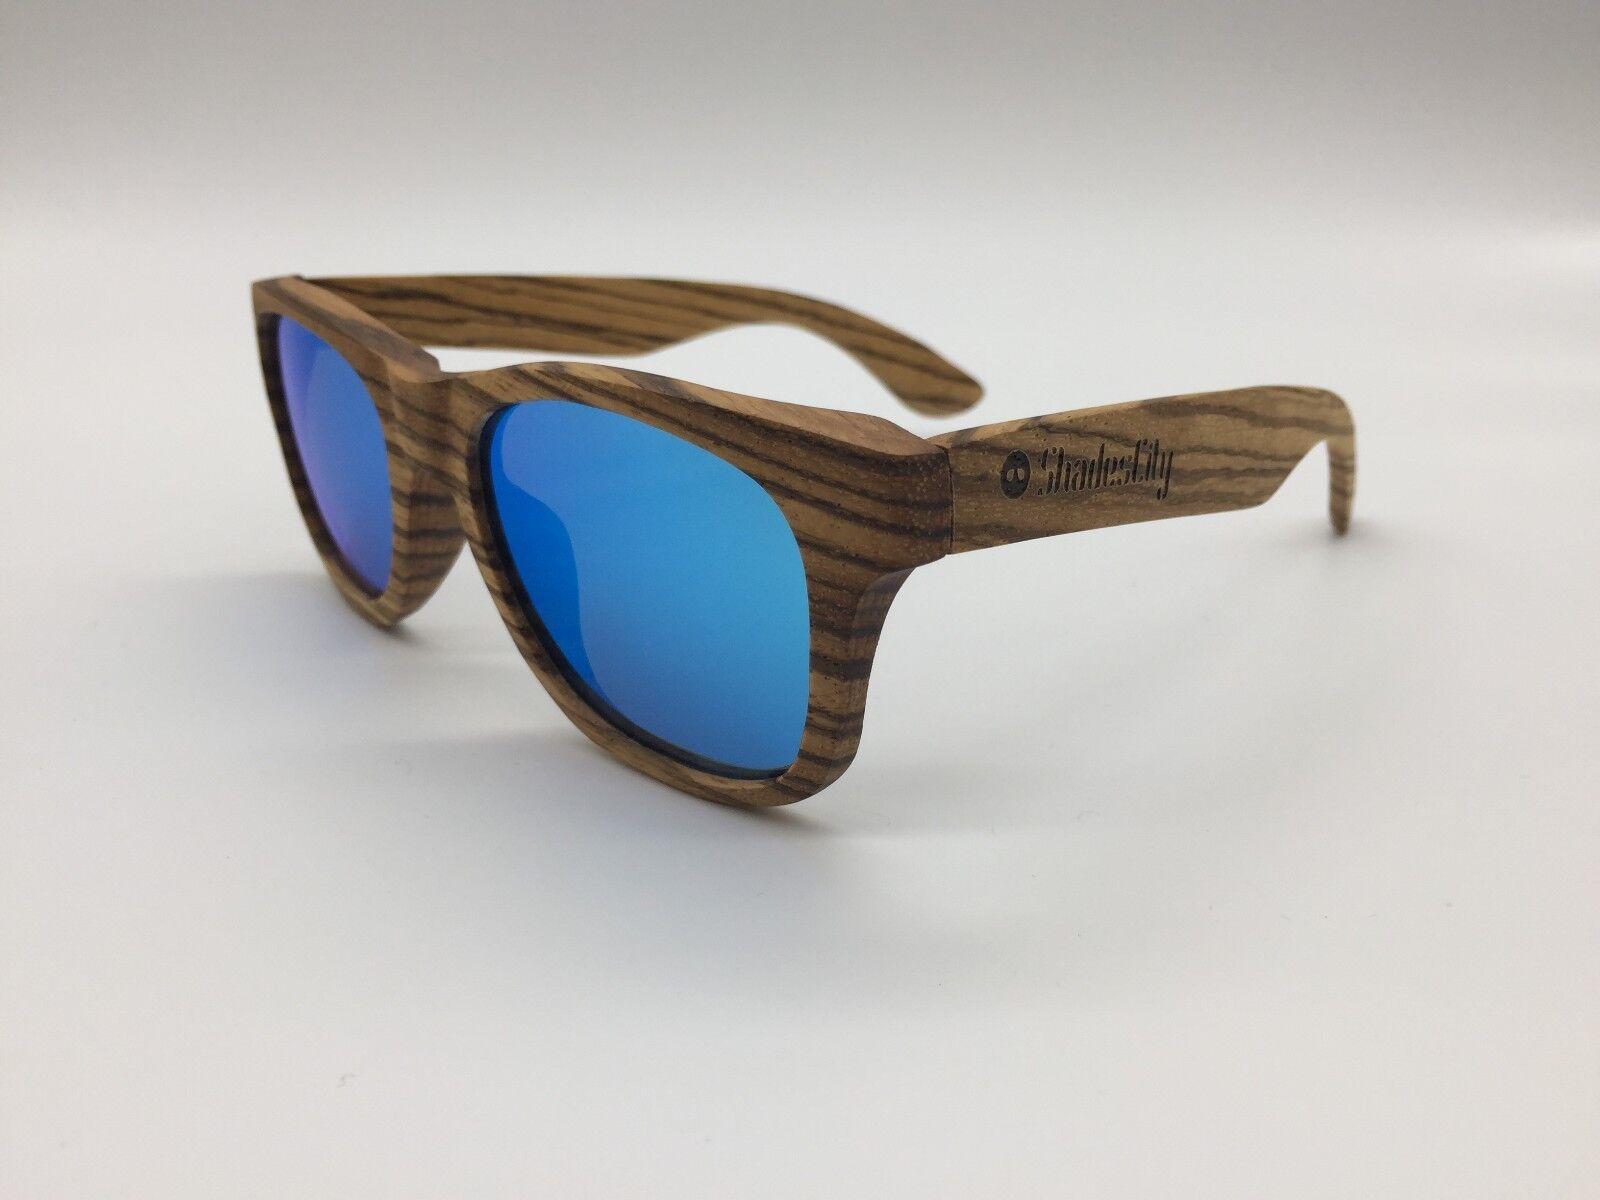 2019 Handcrafted Unisex Zebra Wood Frame Blau Mirror TAC TAC TAC Polarized Sunglasses | Nicht so teuer  fd4531